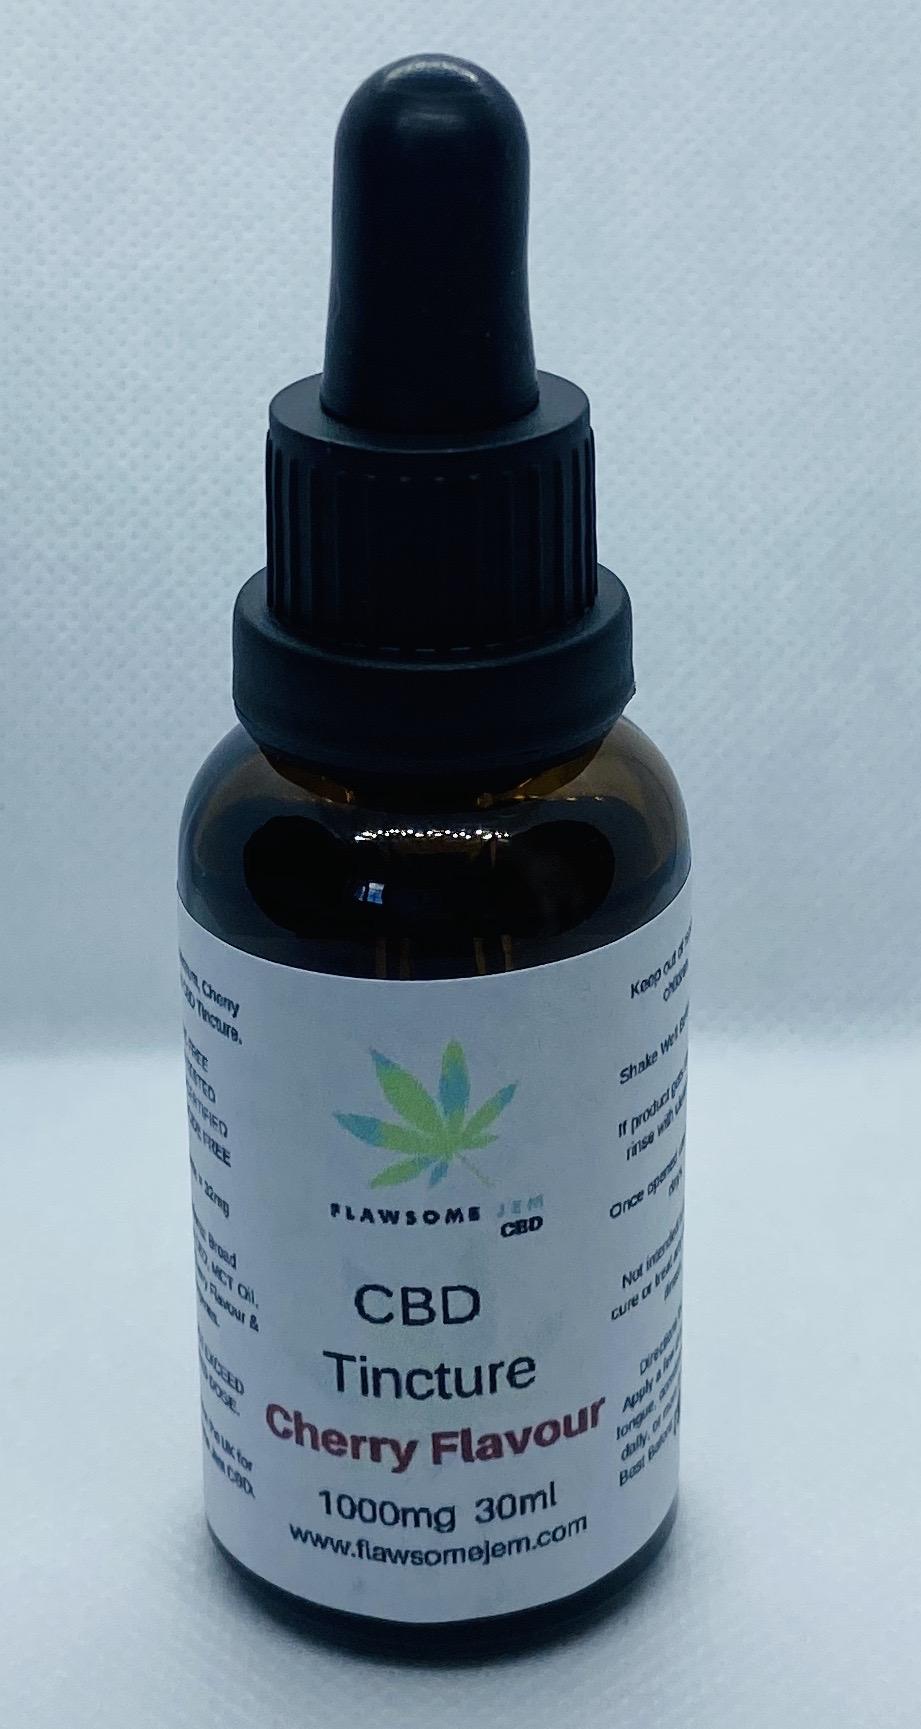 Broad Spectrum CBD Tincture, Cherry Flavour, 1000mg, 30ml